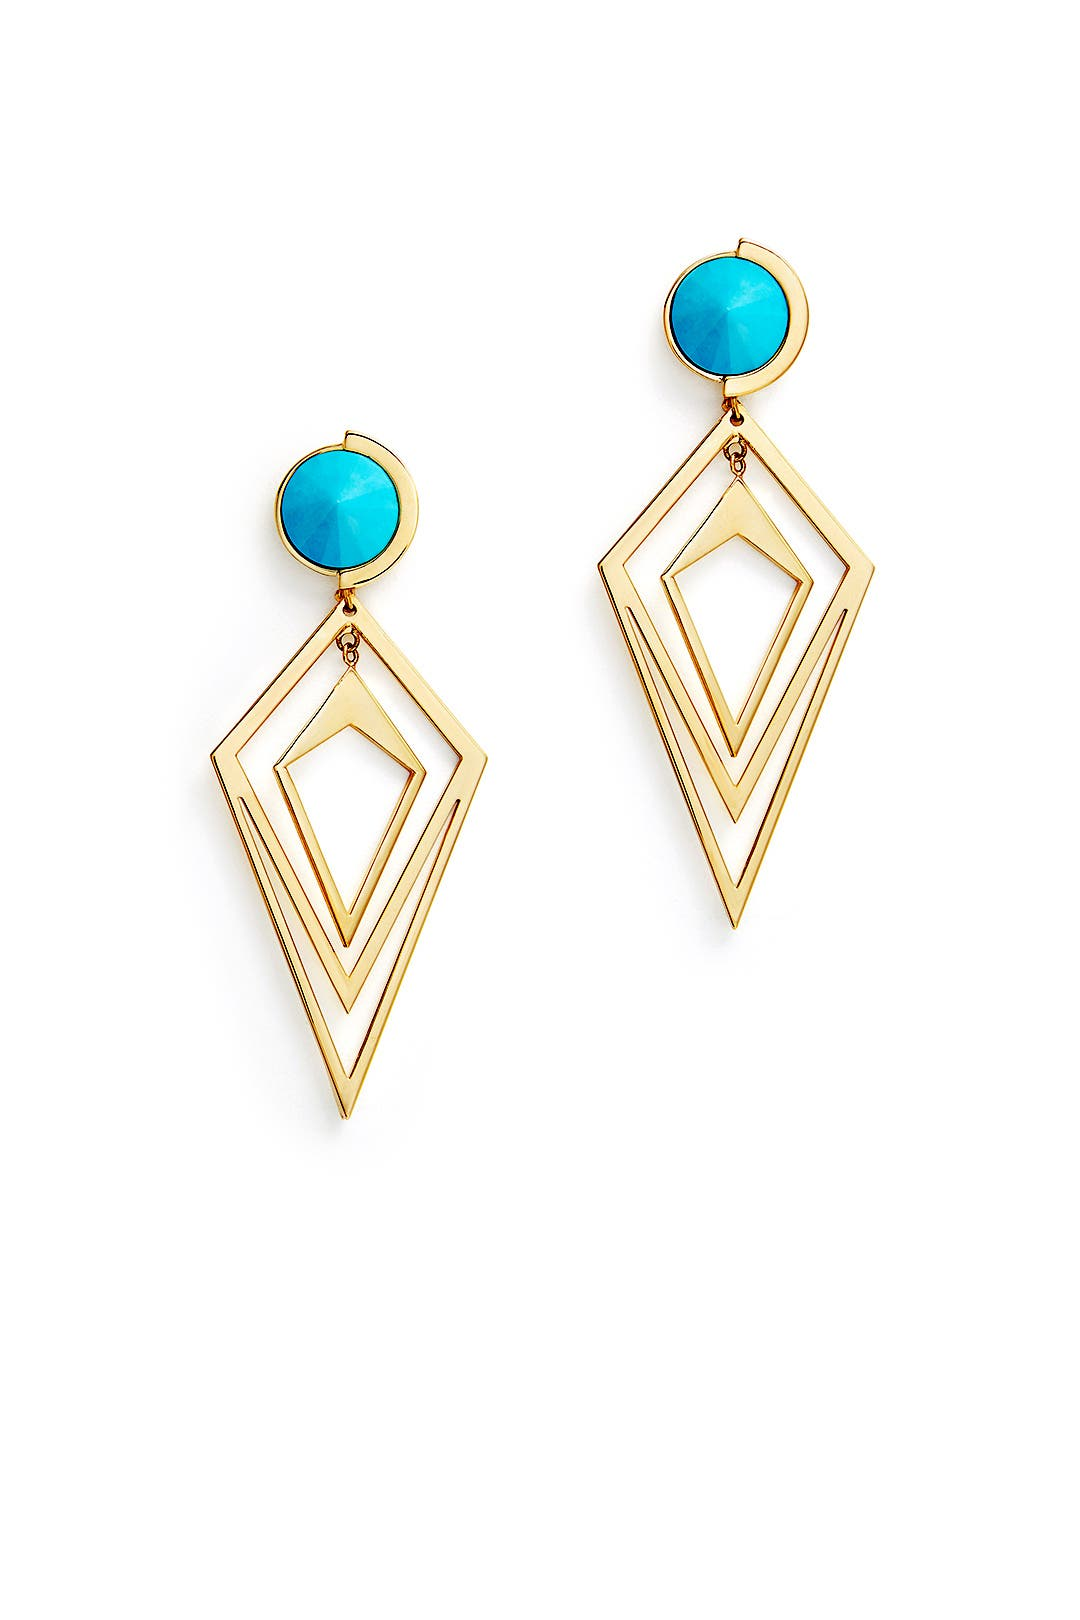 Blue Pointilist Orbita Earrings by Sarah Magid